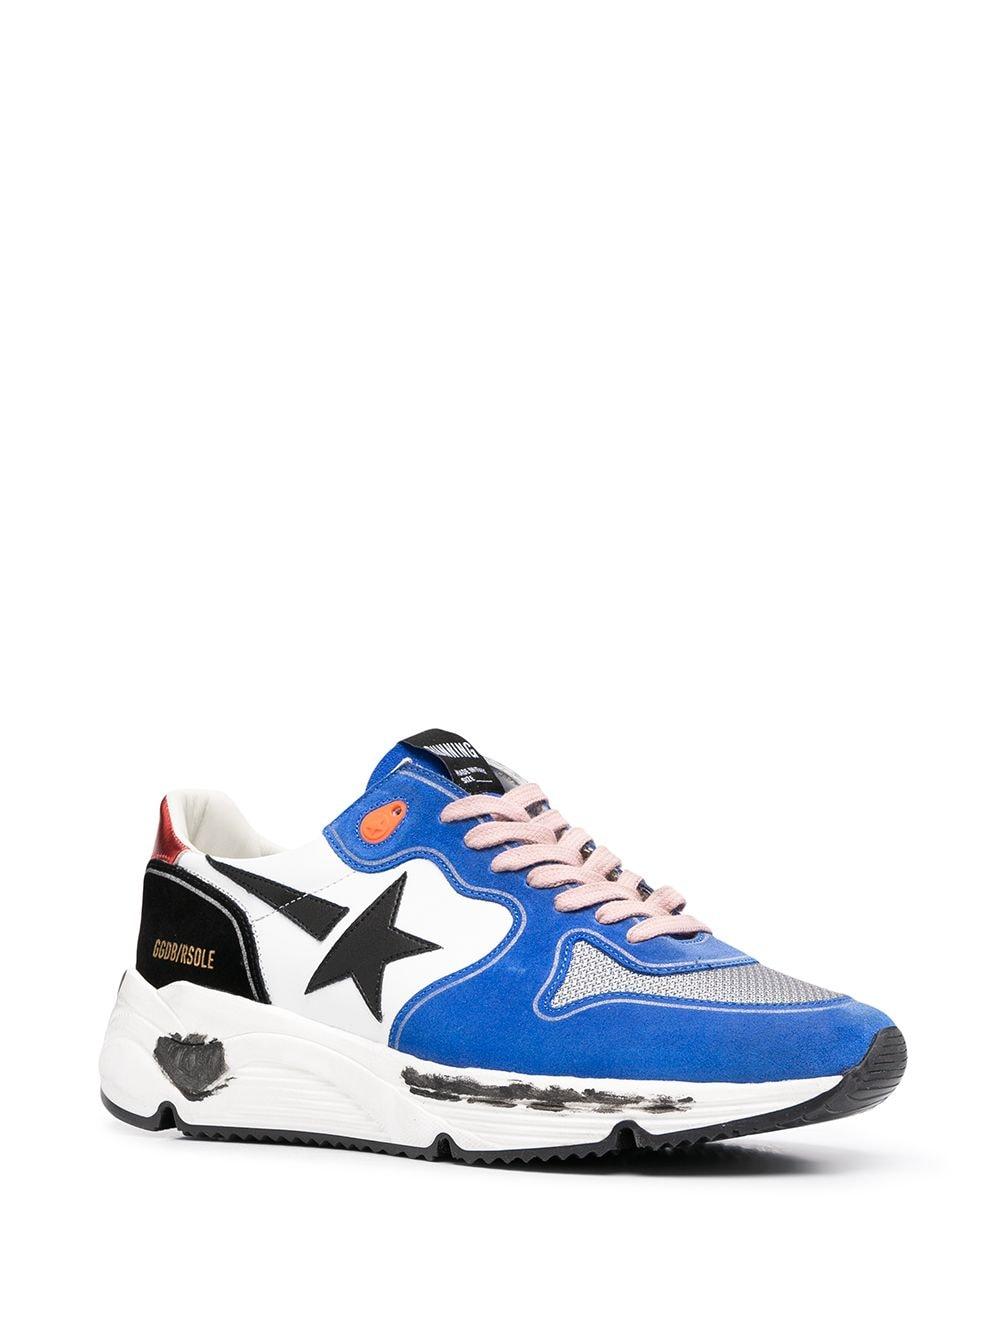 Picture of Golden Goose Deluxe Brand | Running Sole Sneakers